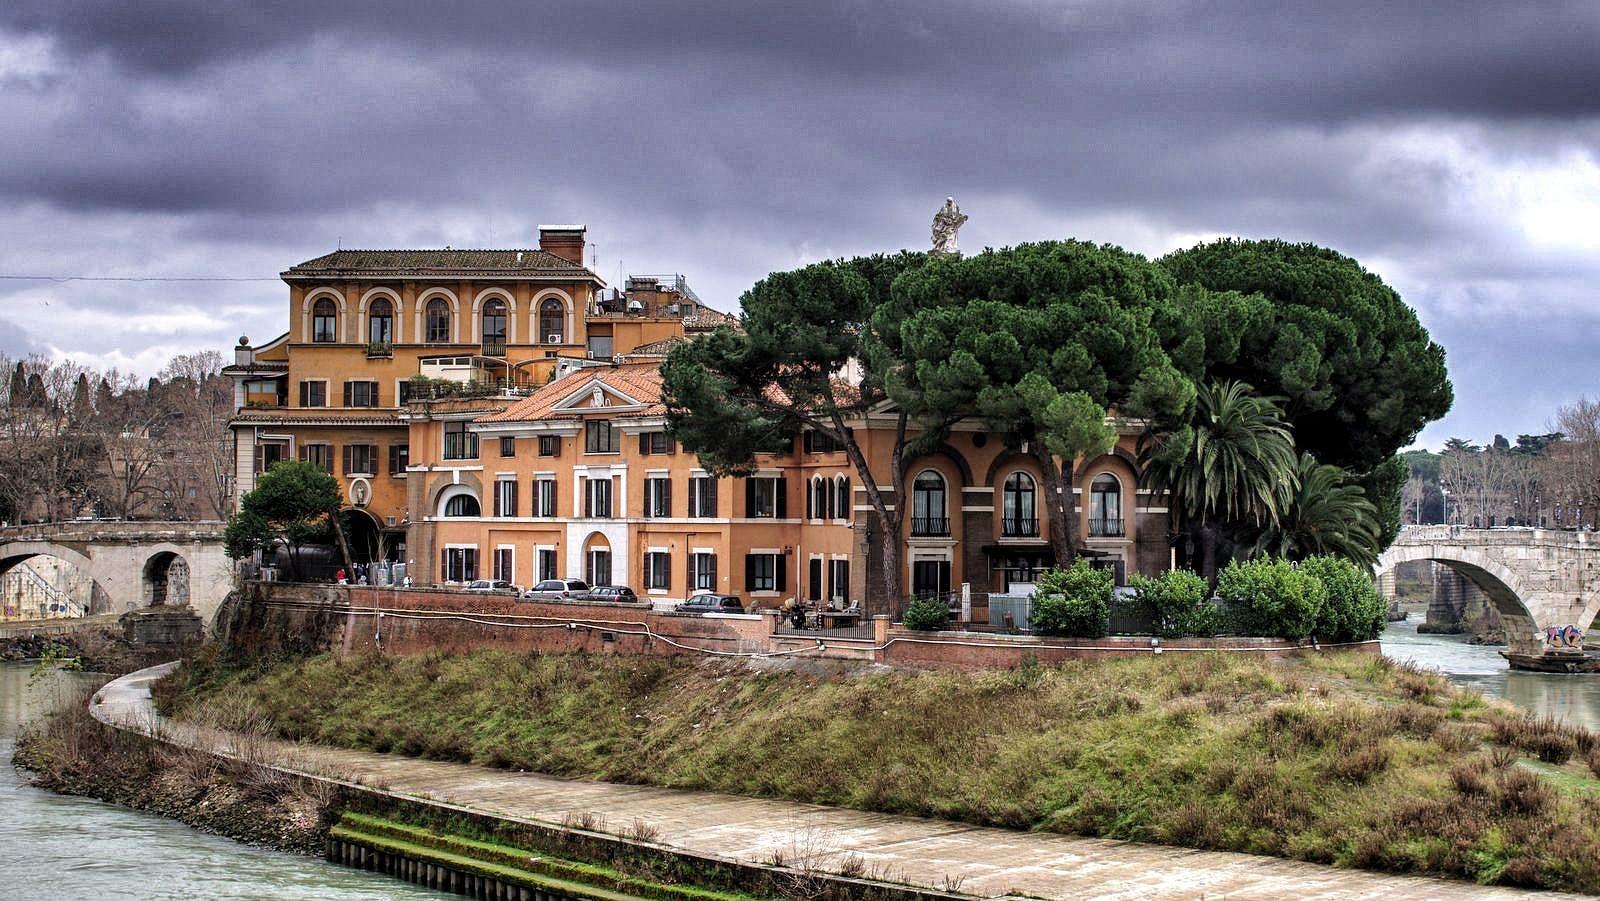 Základová fotografie zdarma na téma architektura, budova, strom, voda